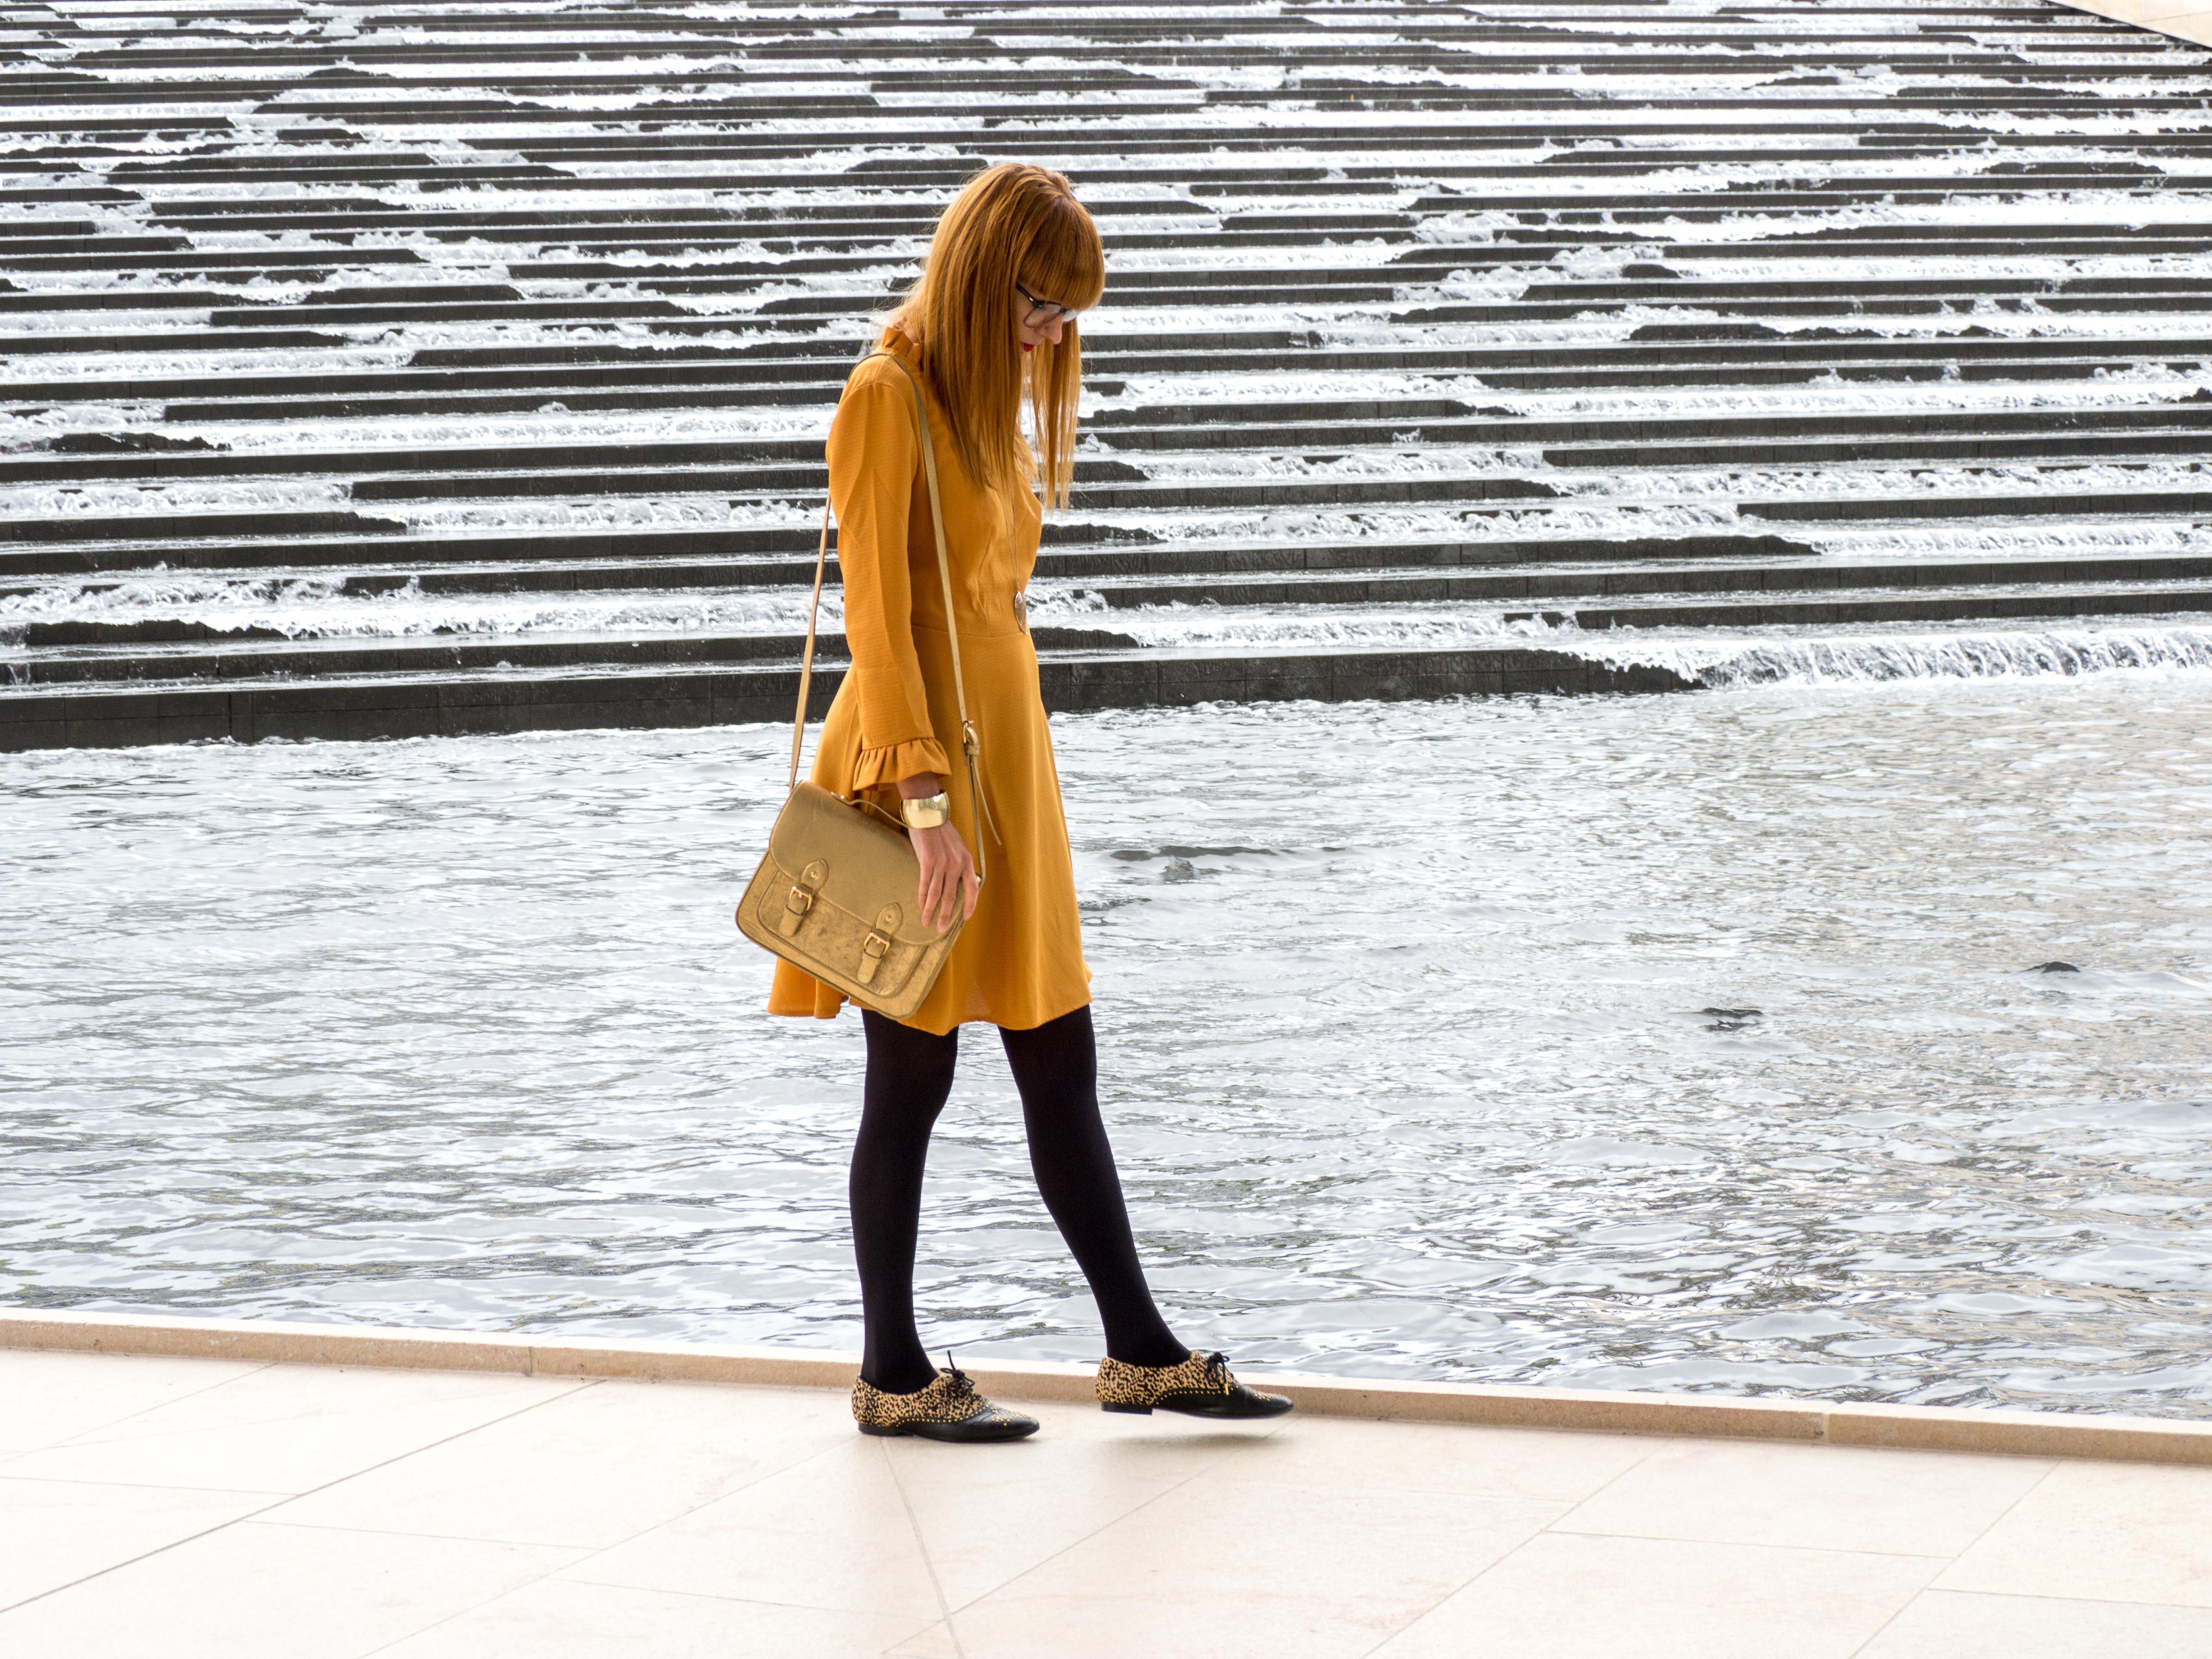 Alyson - Robe jaune